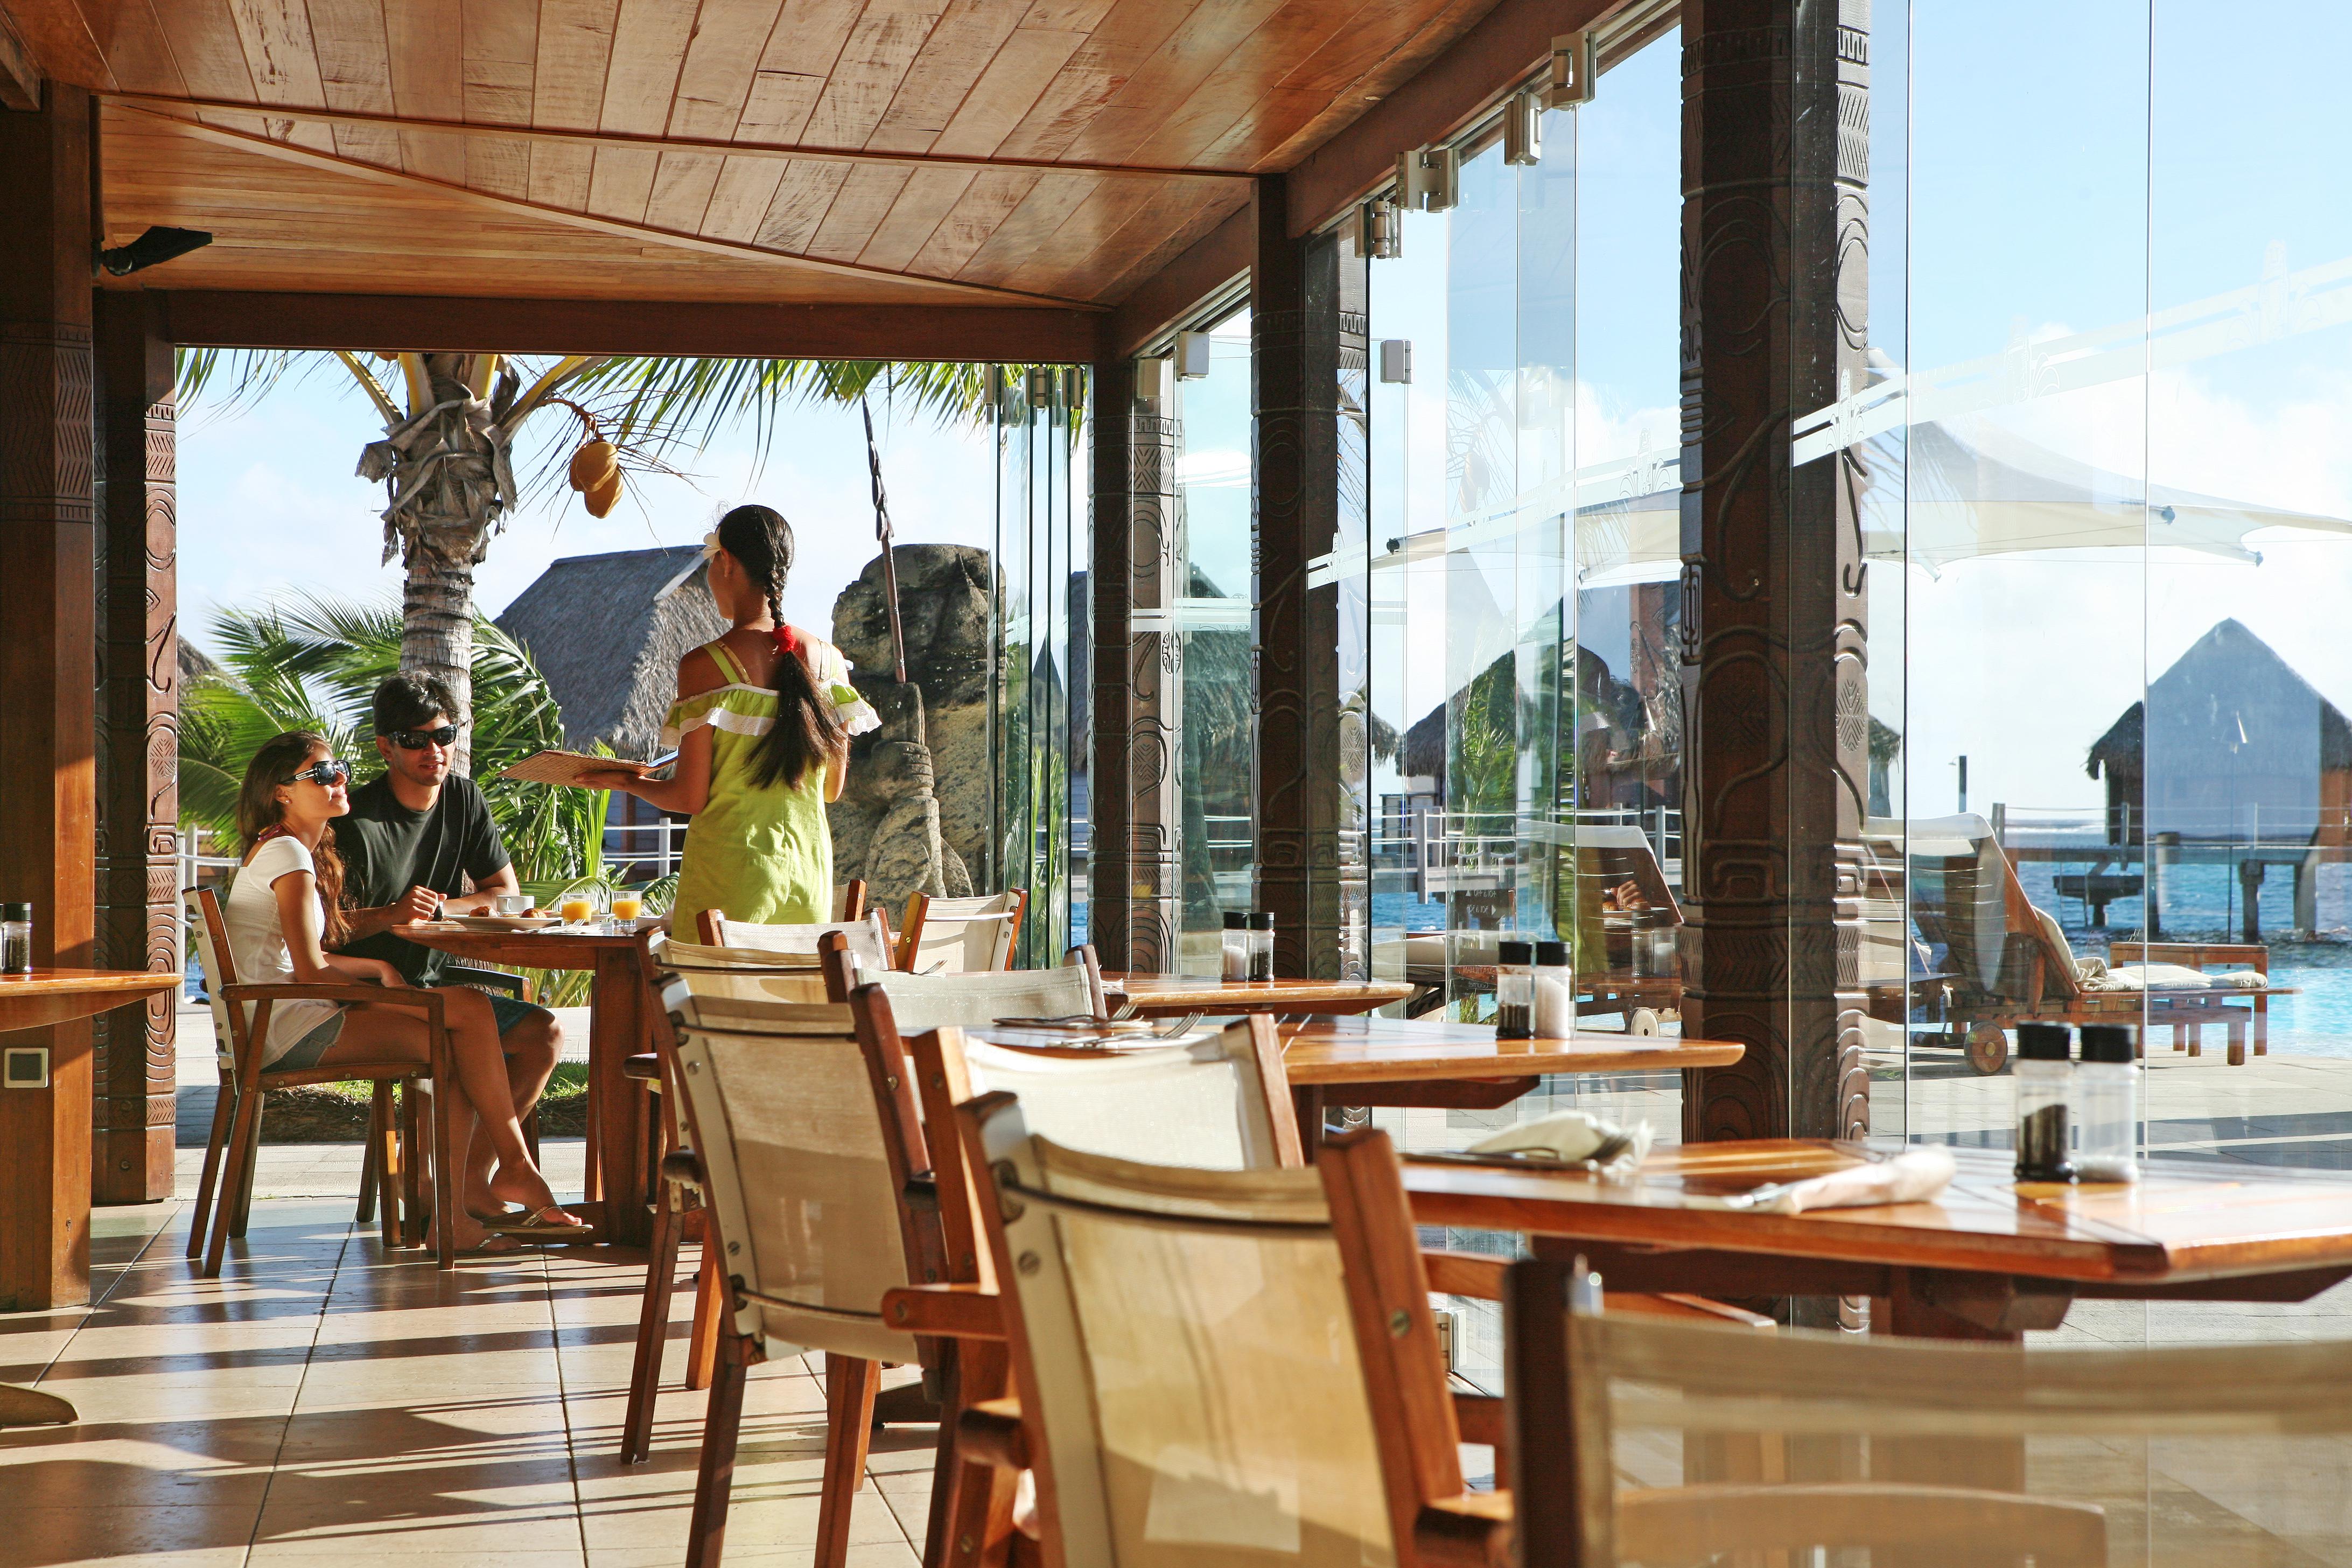 https://tahititourisme.com/wp-content/uploads/2018/03/RESTAURATION-Restaurant-Mahanai-3-Greg_LeBacon.jpg